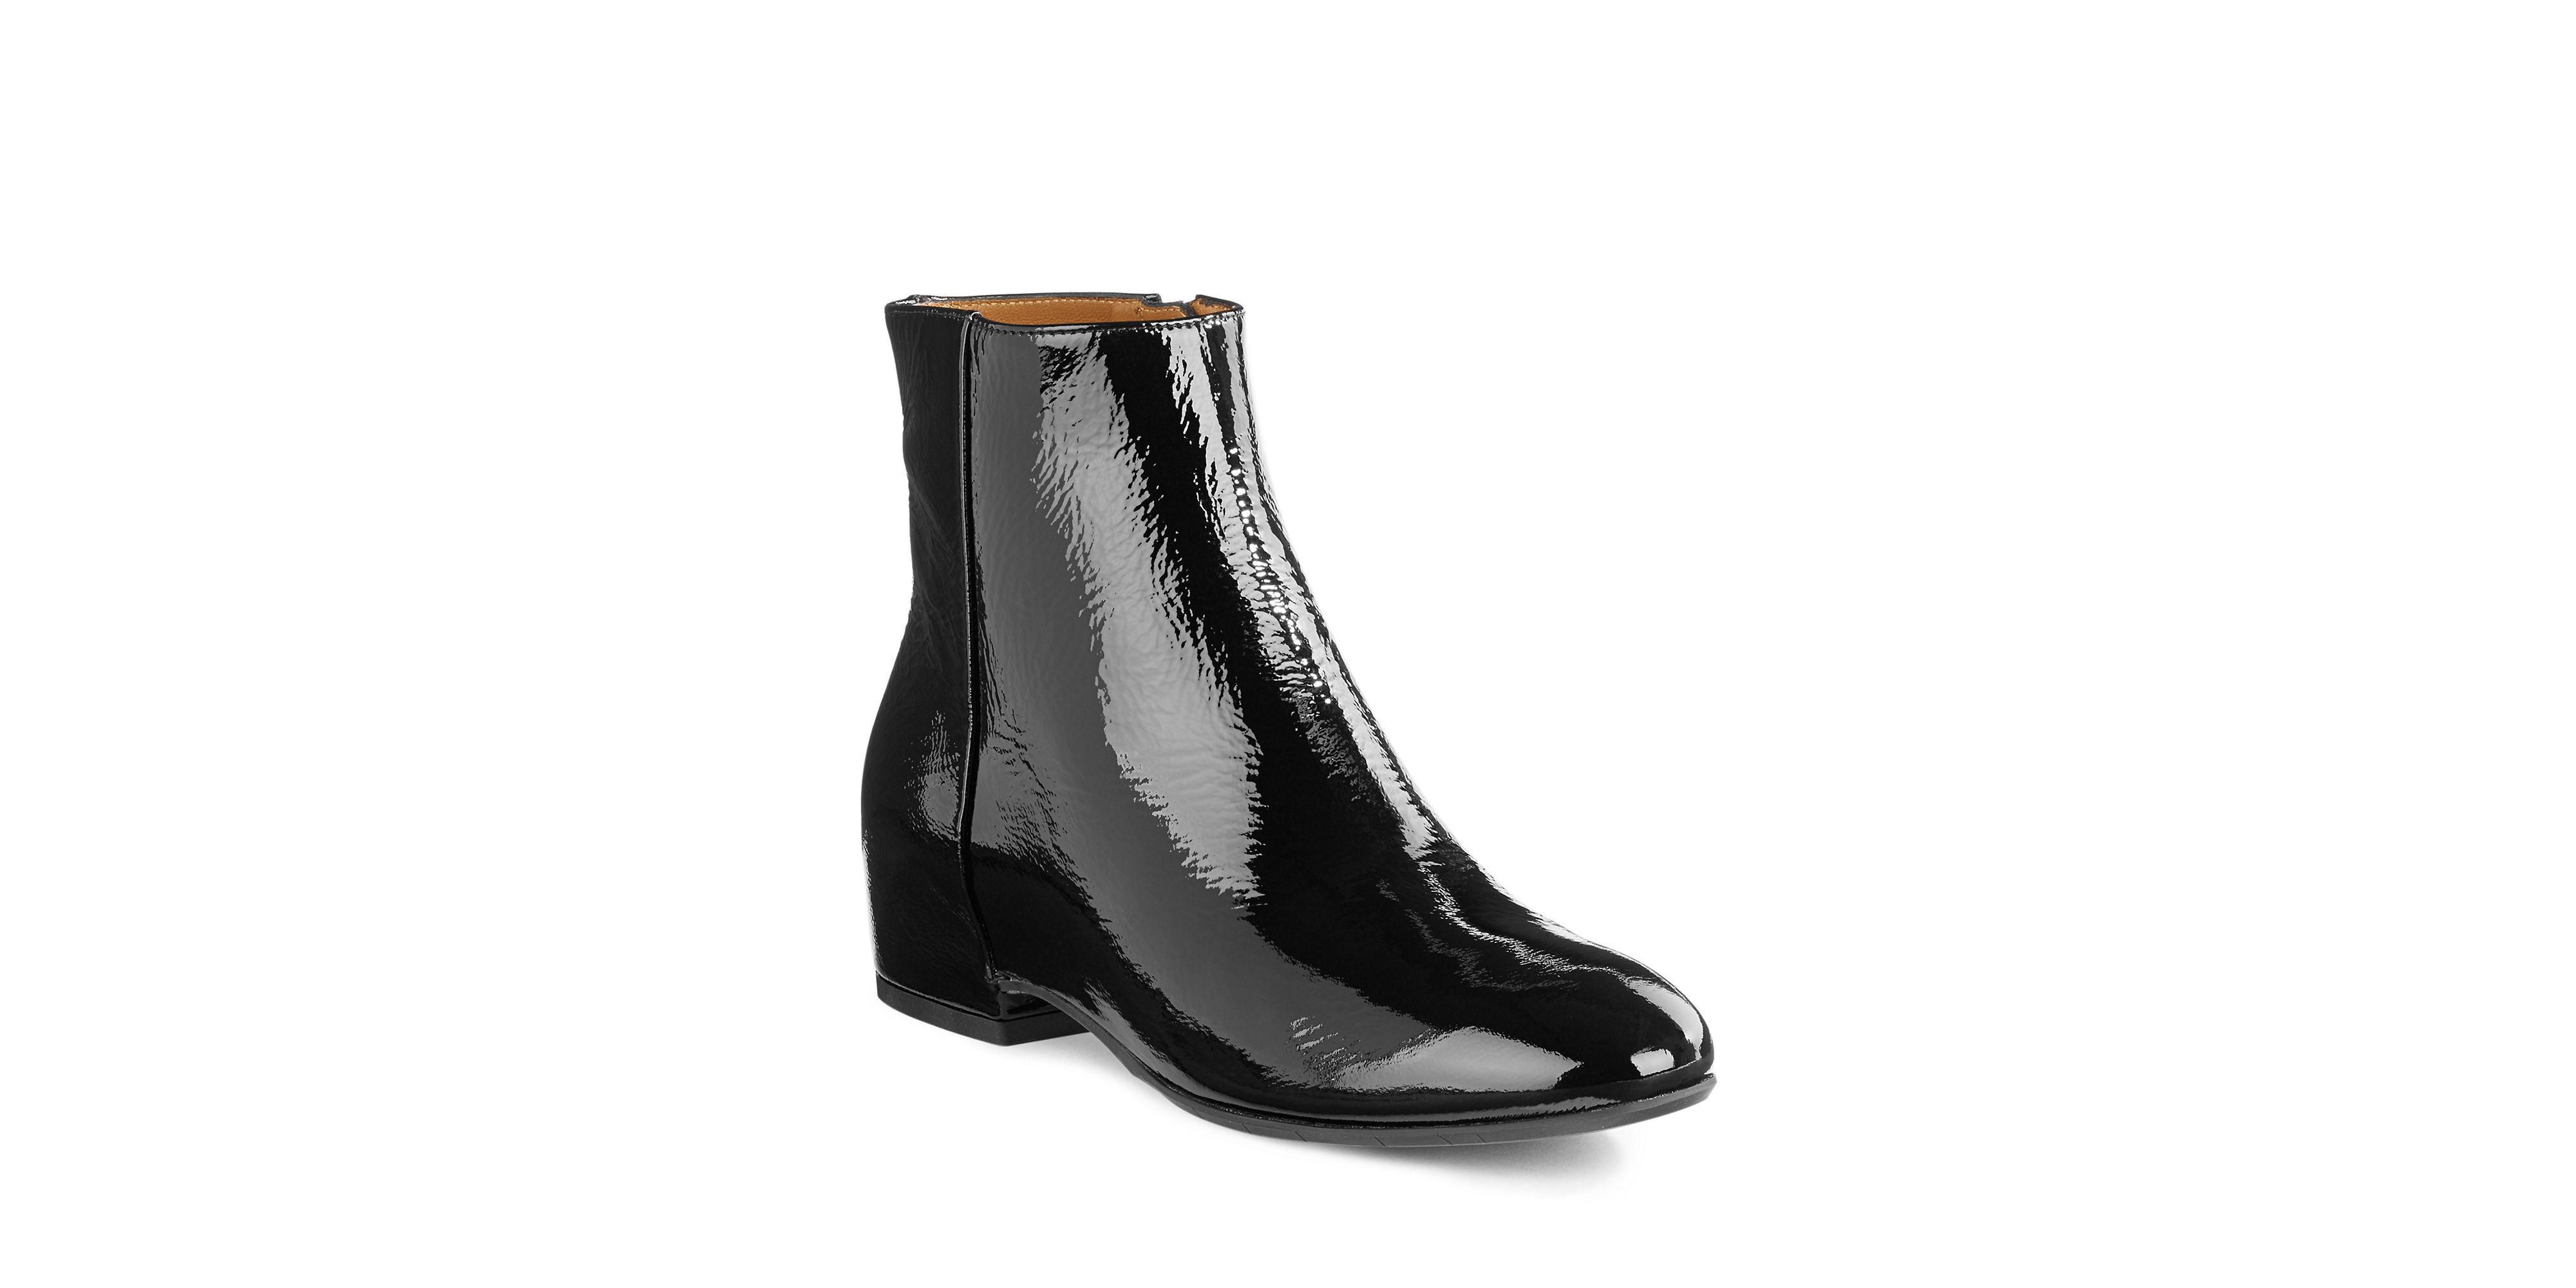 aquatalia uri patent leather ankle boots in black lyst